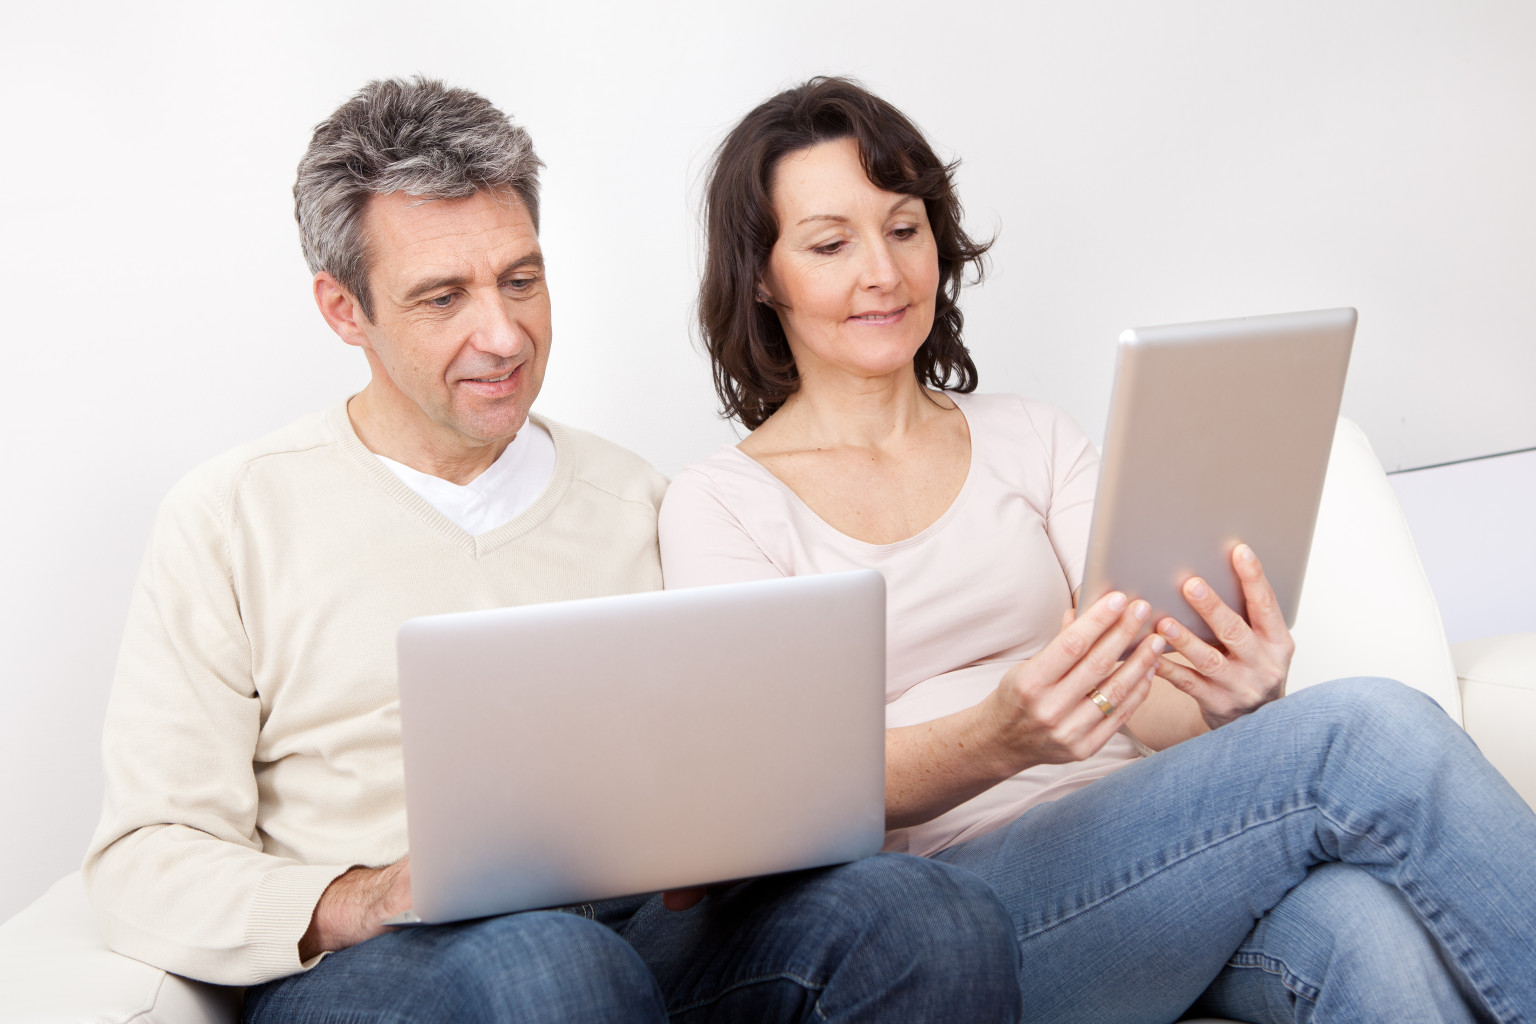 Parents using Facebook